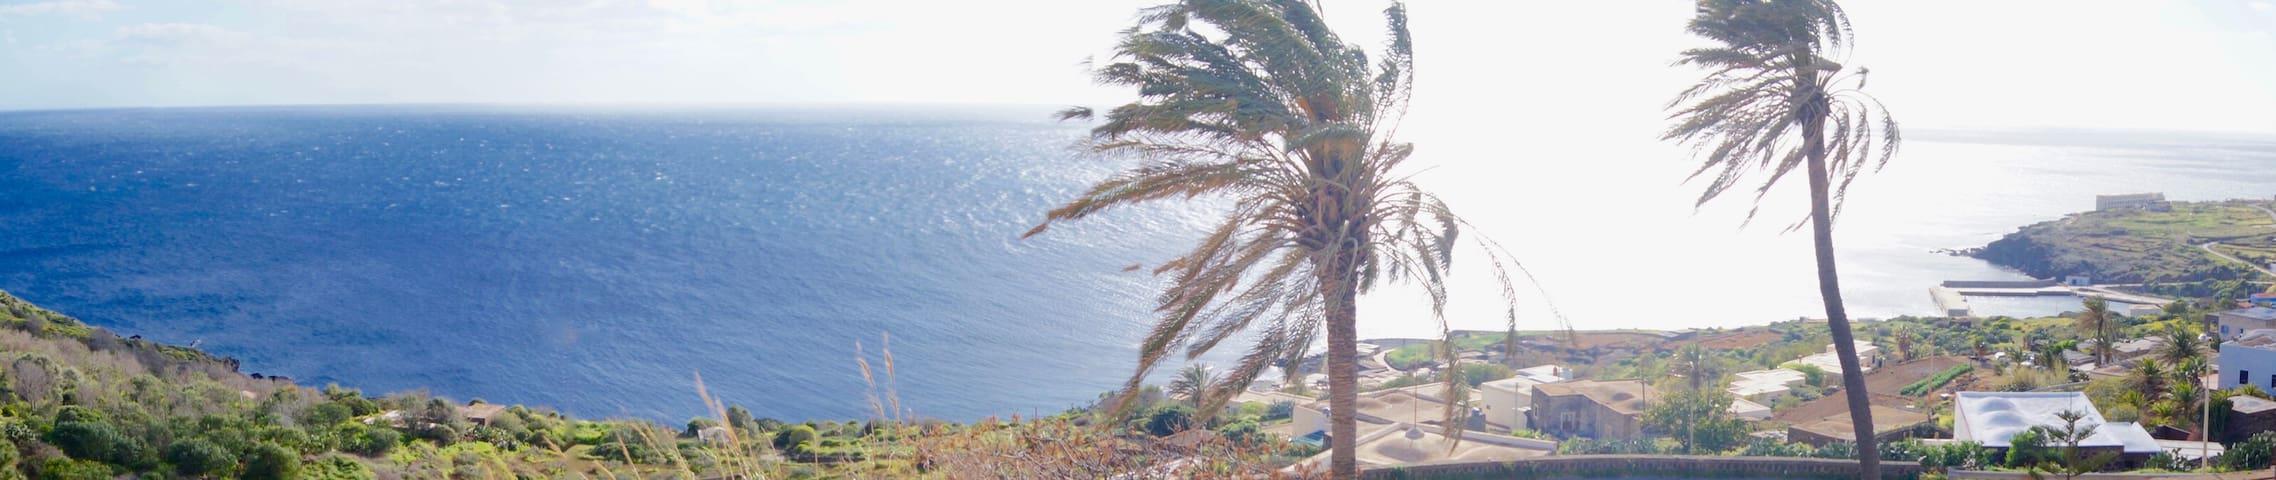 Dammuso Gelso - Pantelleria - Apartamento